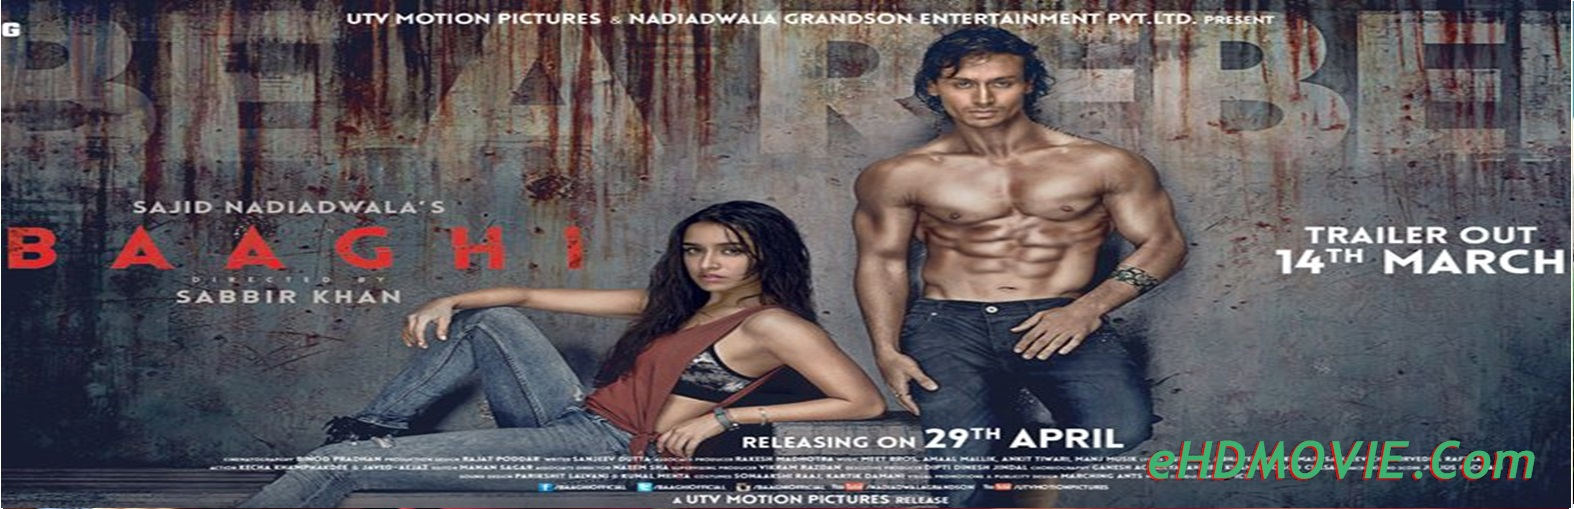 Baaghi 2016 Full Movie Hindi 720p - 480p ORG BRRip 500MB - 1.2GB ESubs Free Download